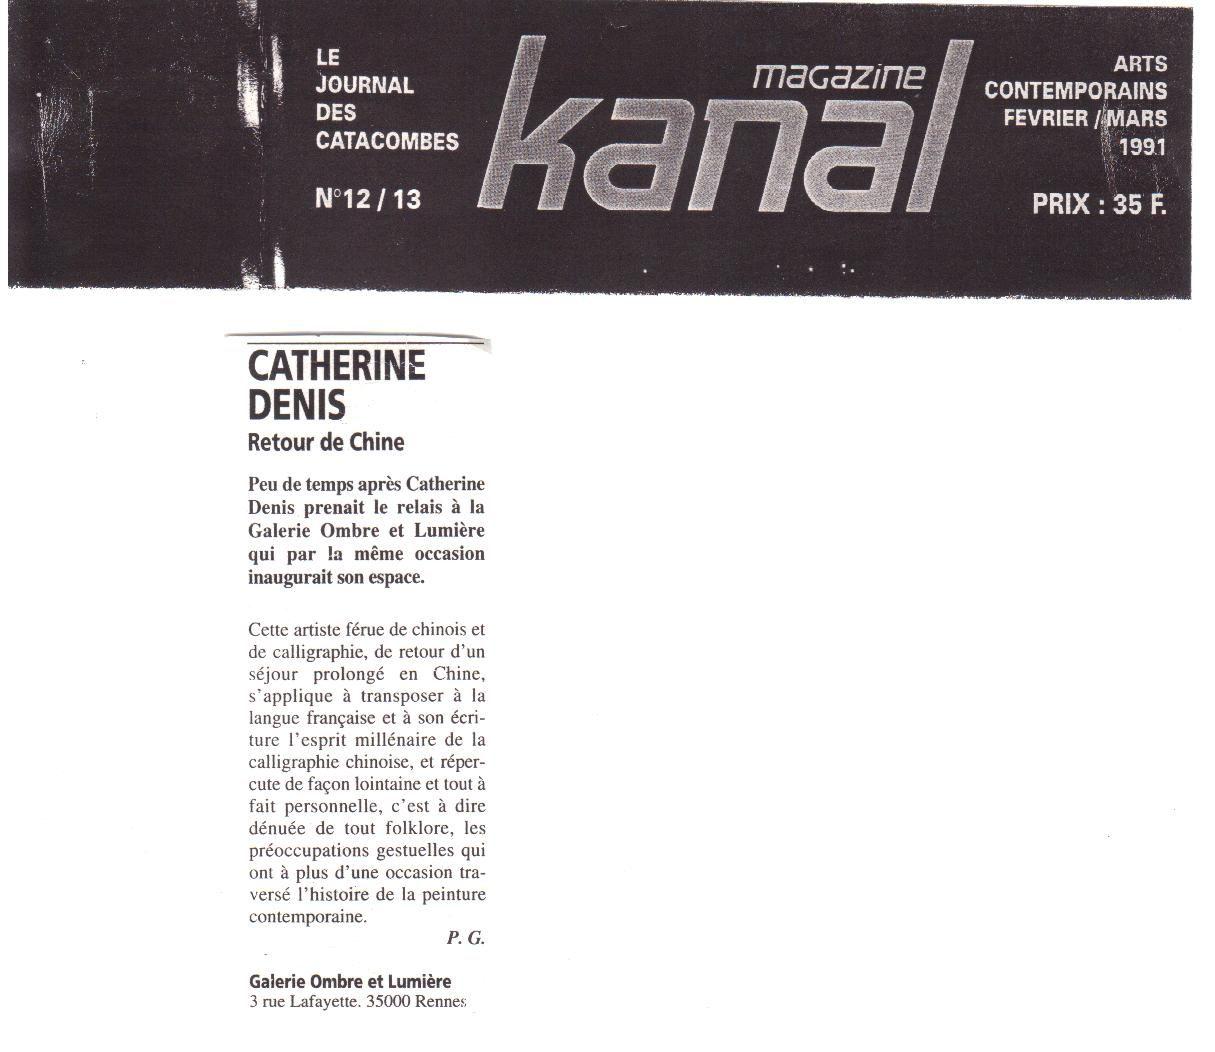 1991 - Kanal Arts contemporains